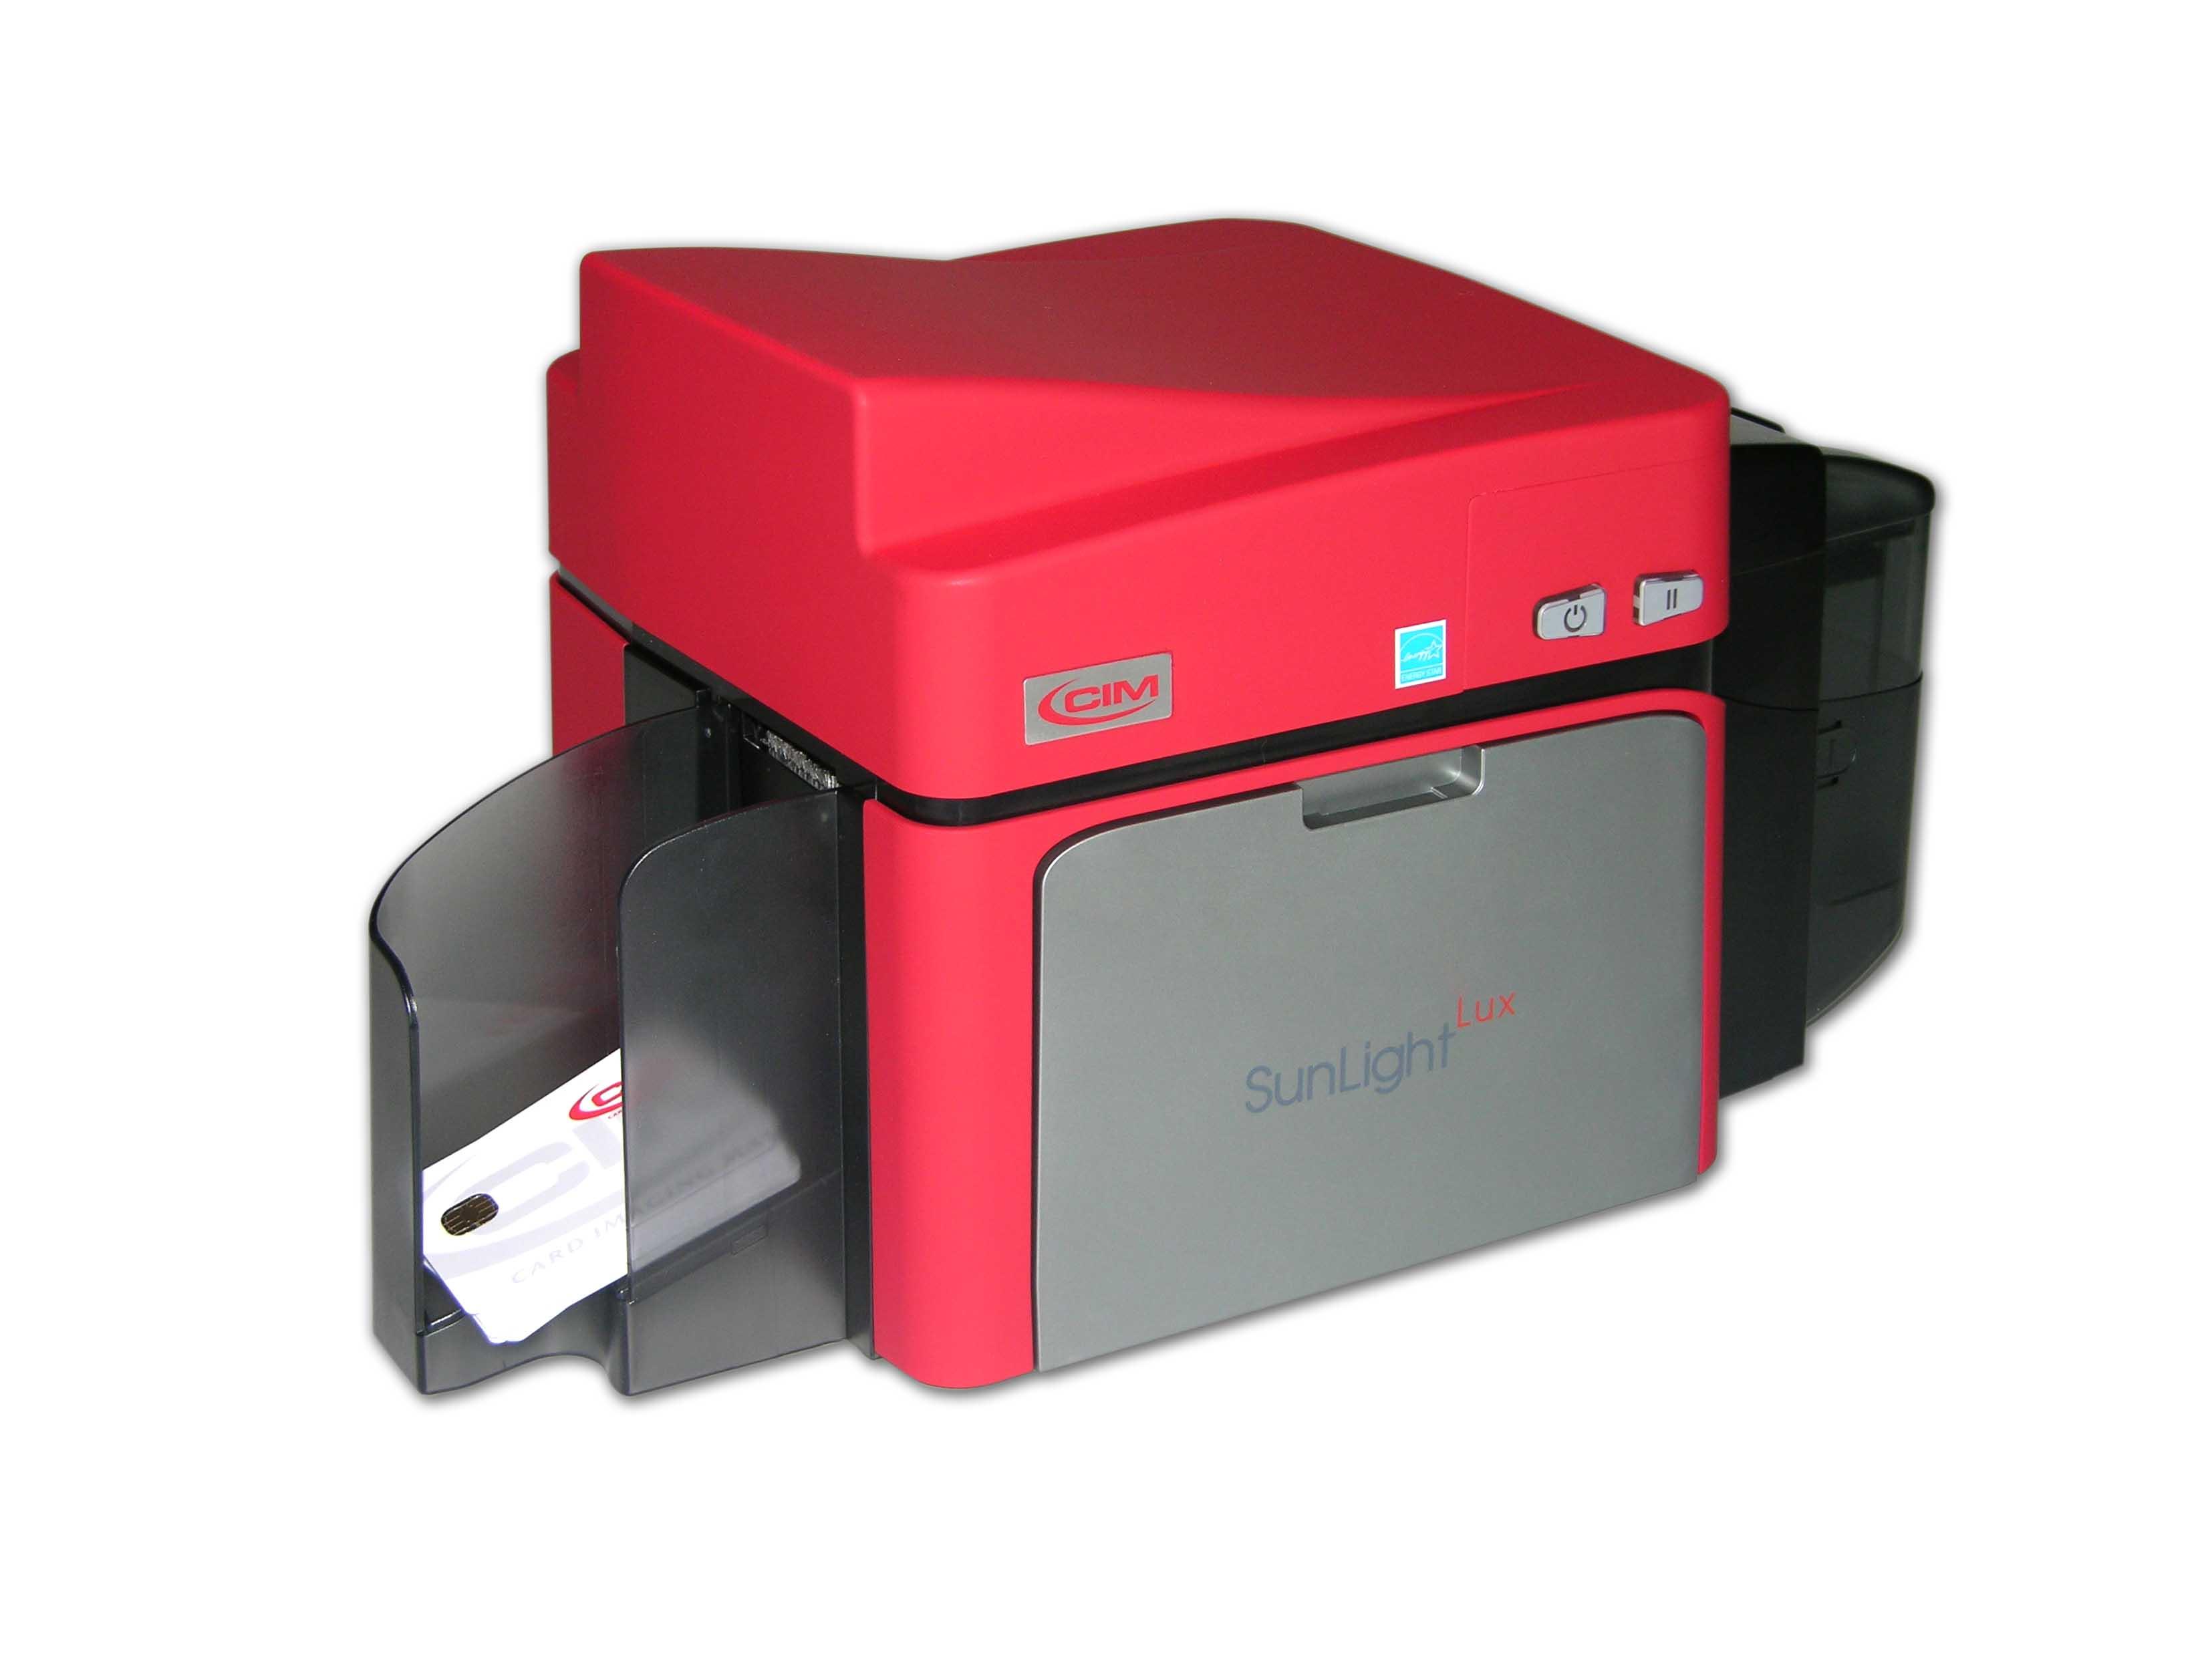 Impresora CIM SunLight K3